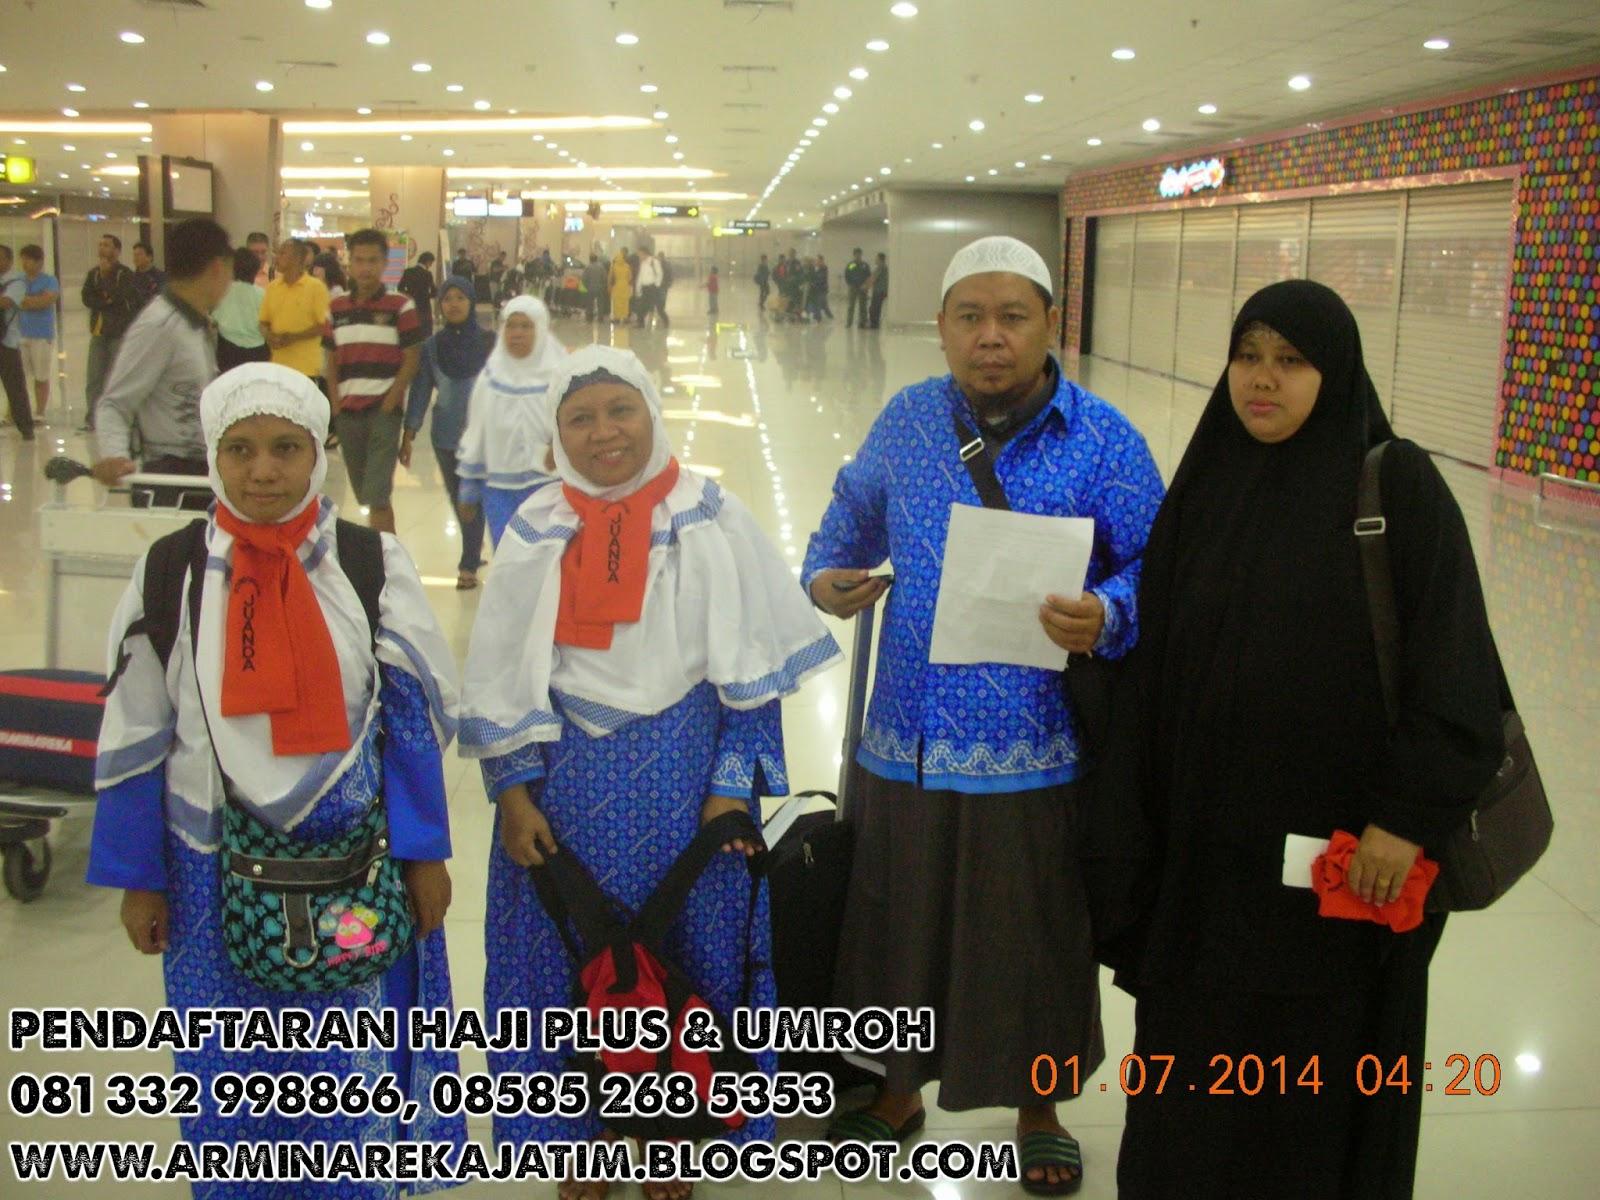 http://arminarekajatim.blogspot.com/2014/07/daftar-nama-jamaah-umroh-full-ramadhan.html